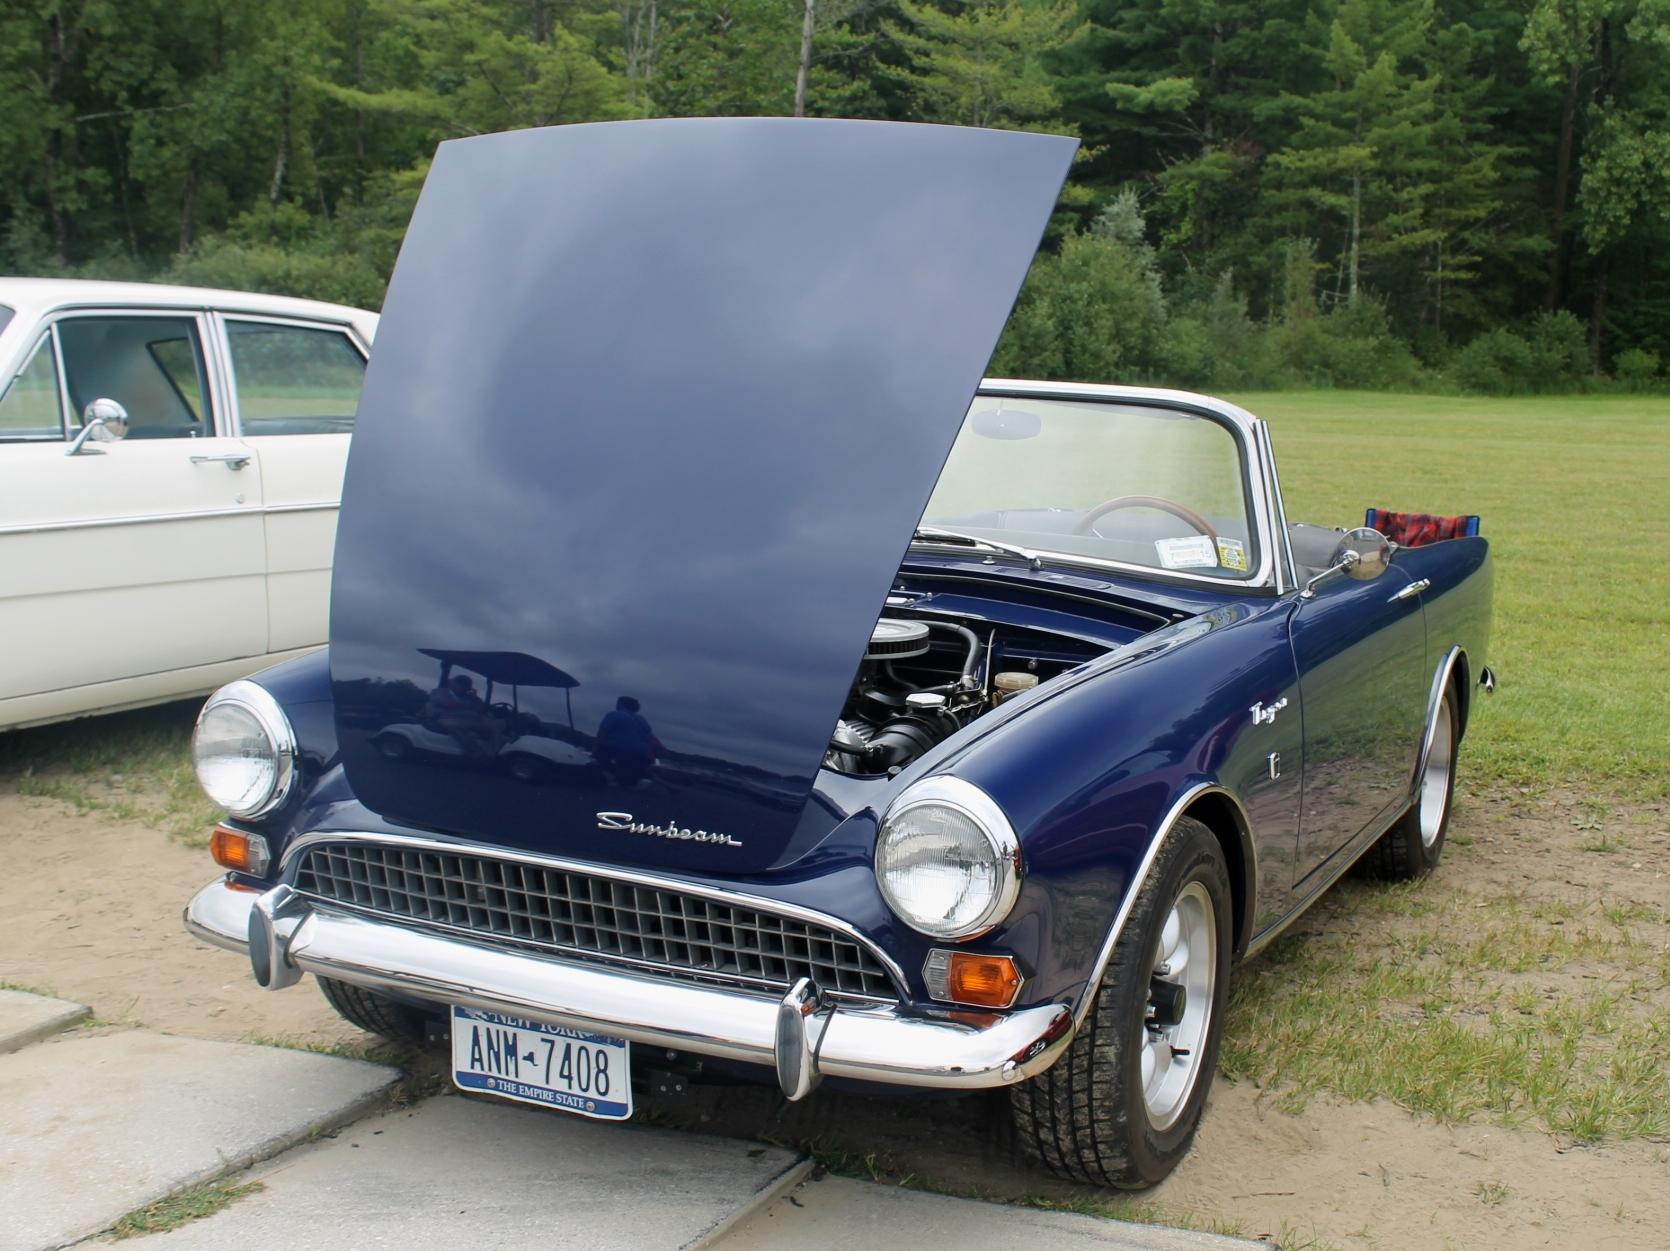 SOLD: 1966 Sunbeam Tiger MK1A Real 289 HIPO Motor ...